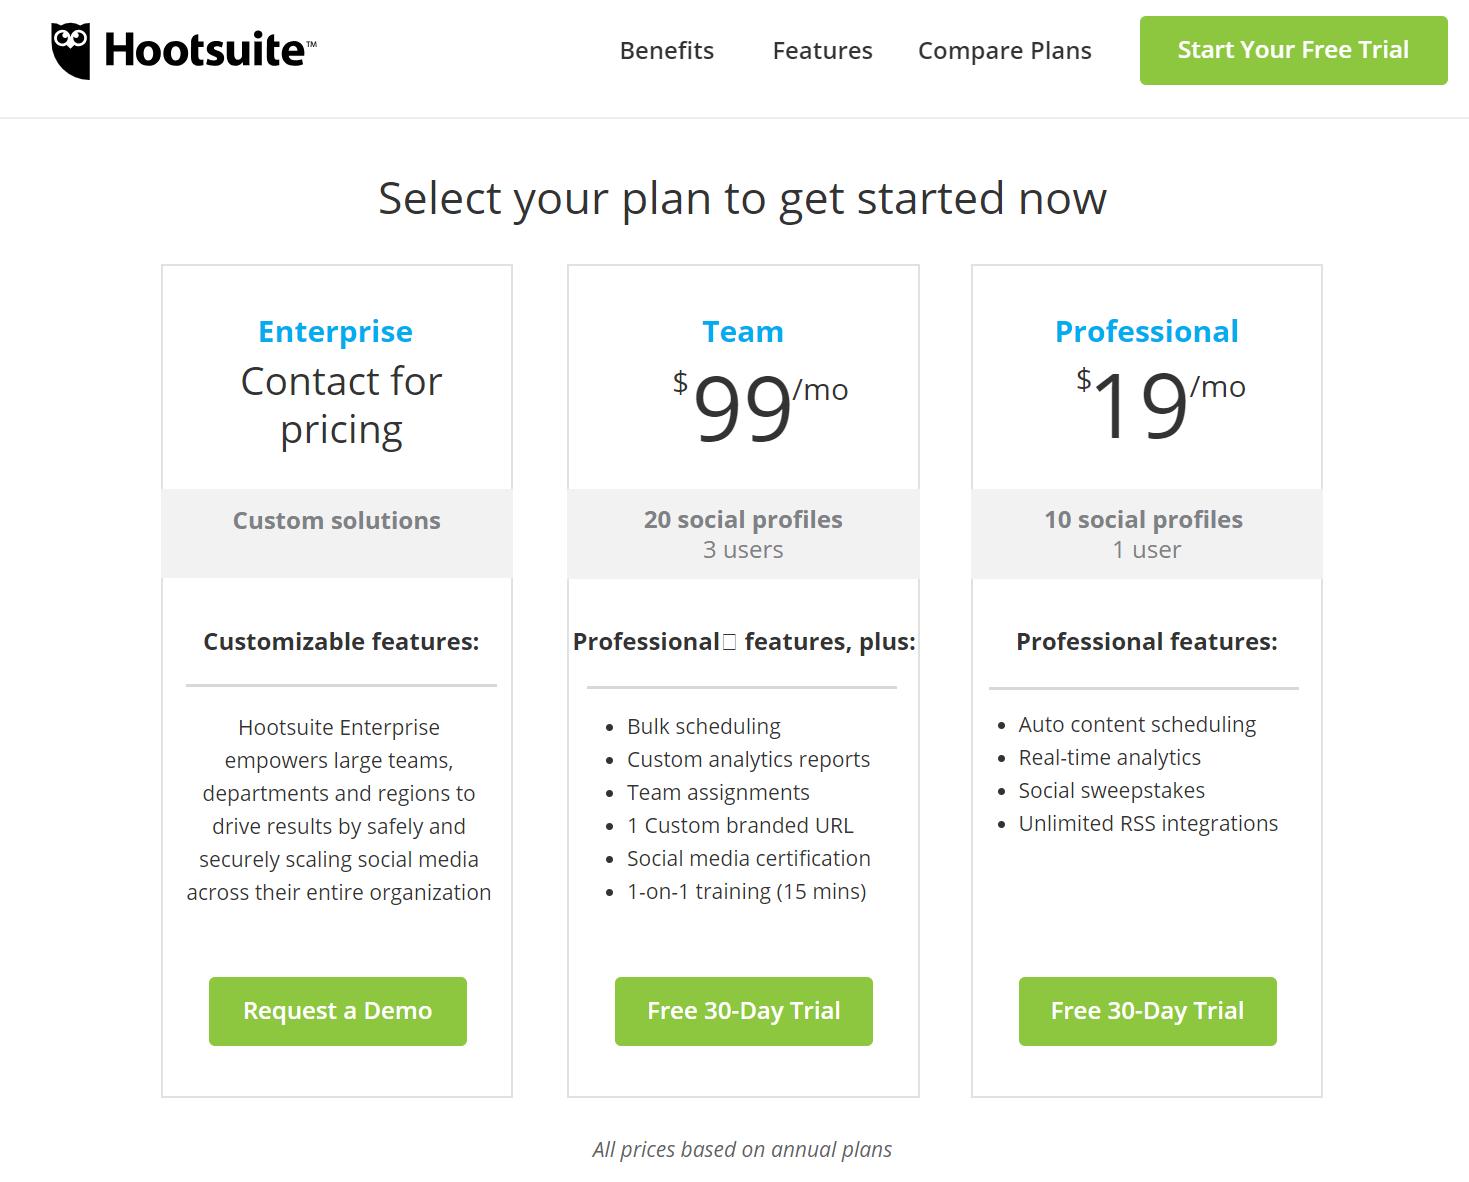 Hootsuite prices